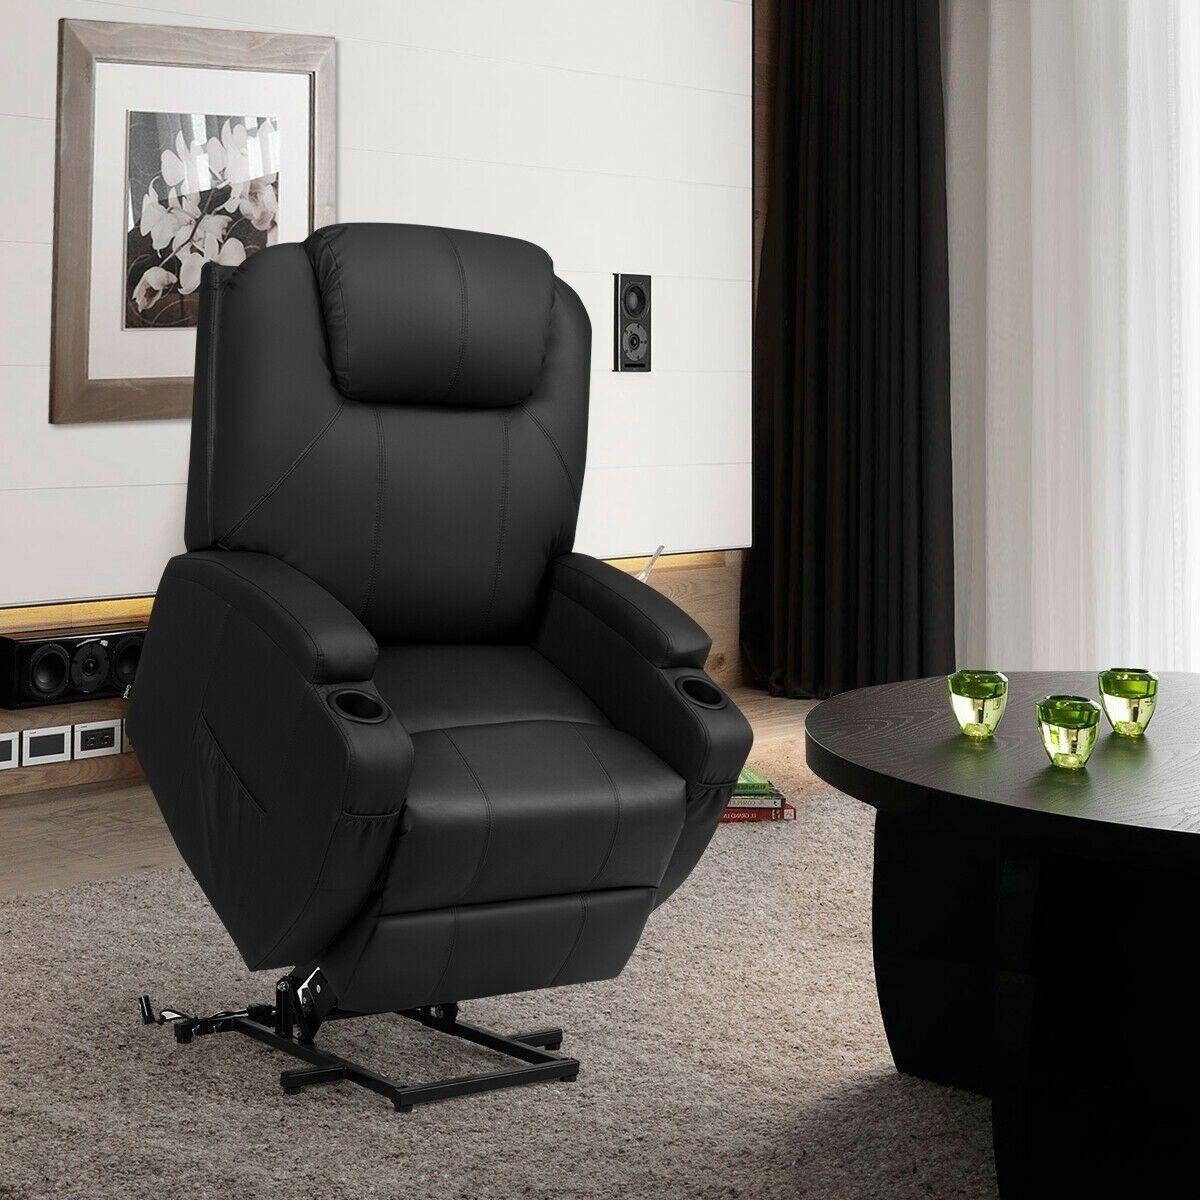 Electric lift power recliner heated vibration massage